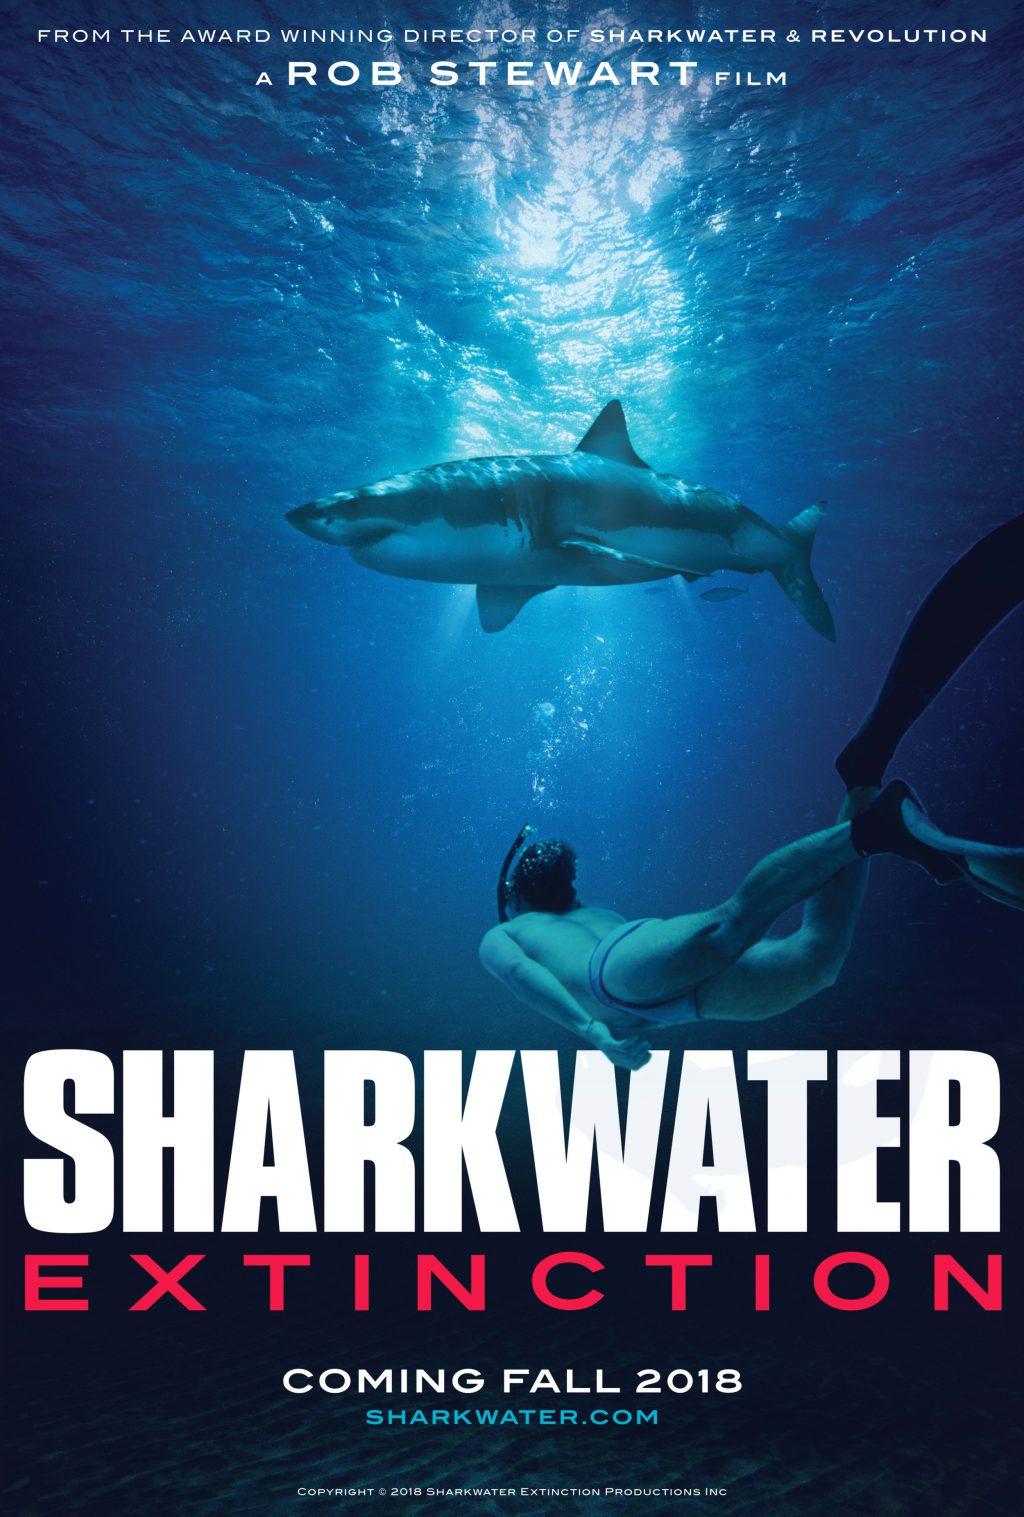 Sharkwater: Extinction Teaser Poster